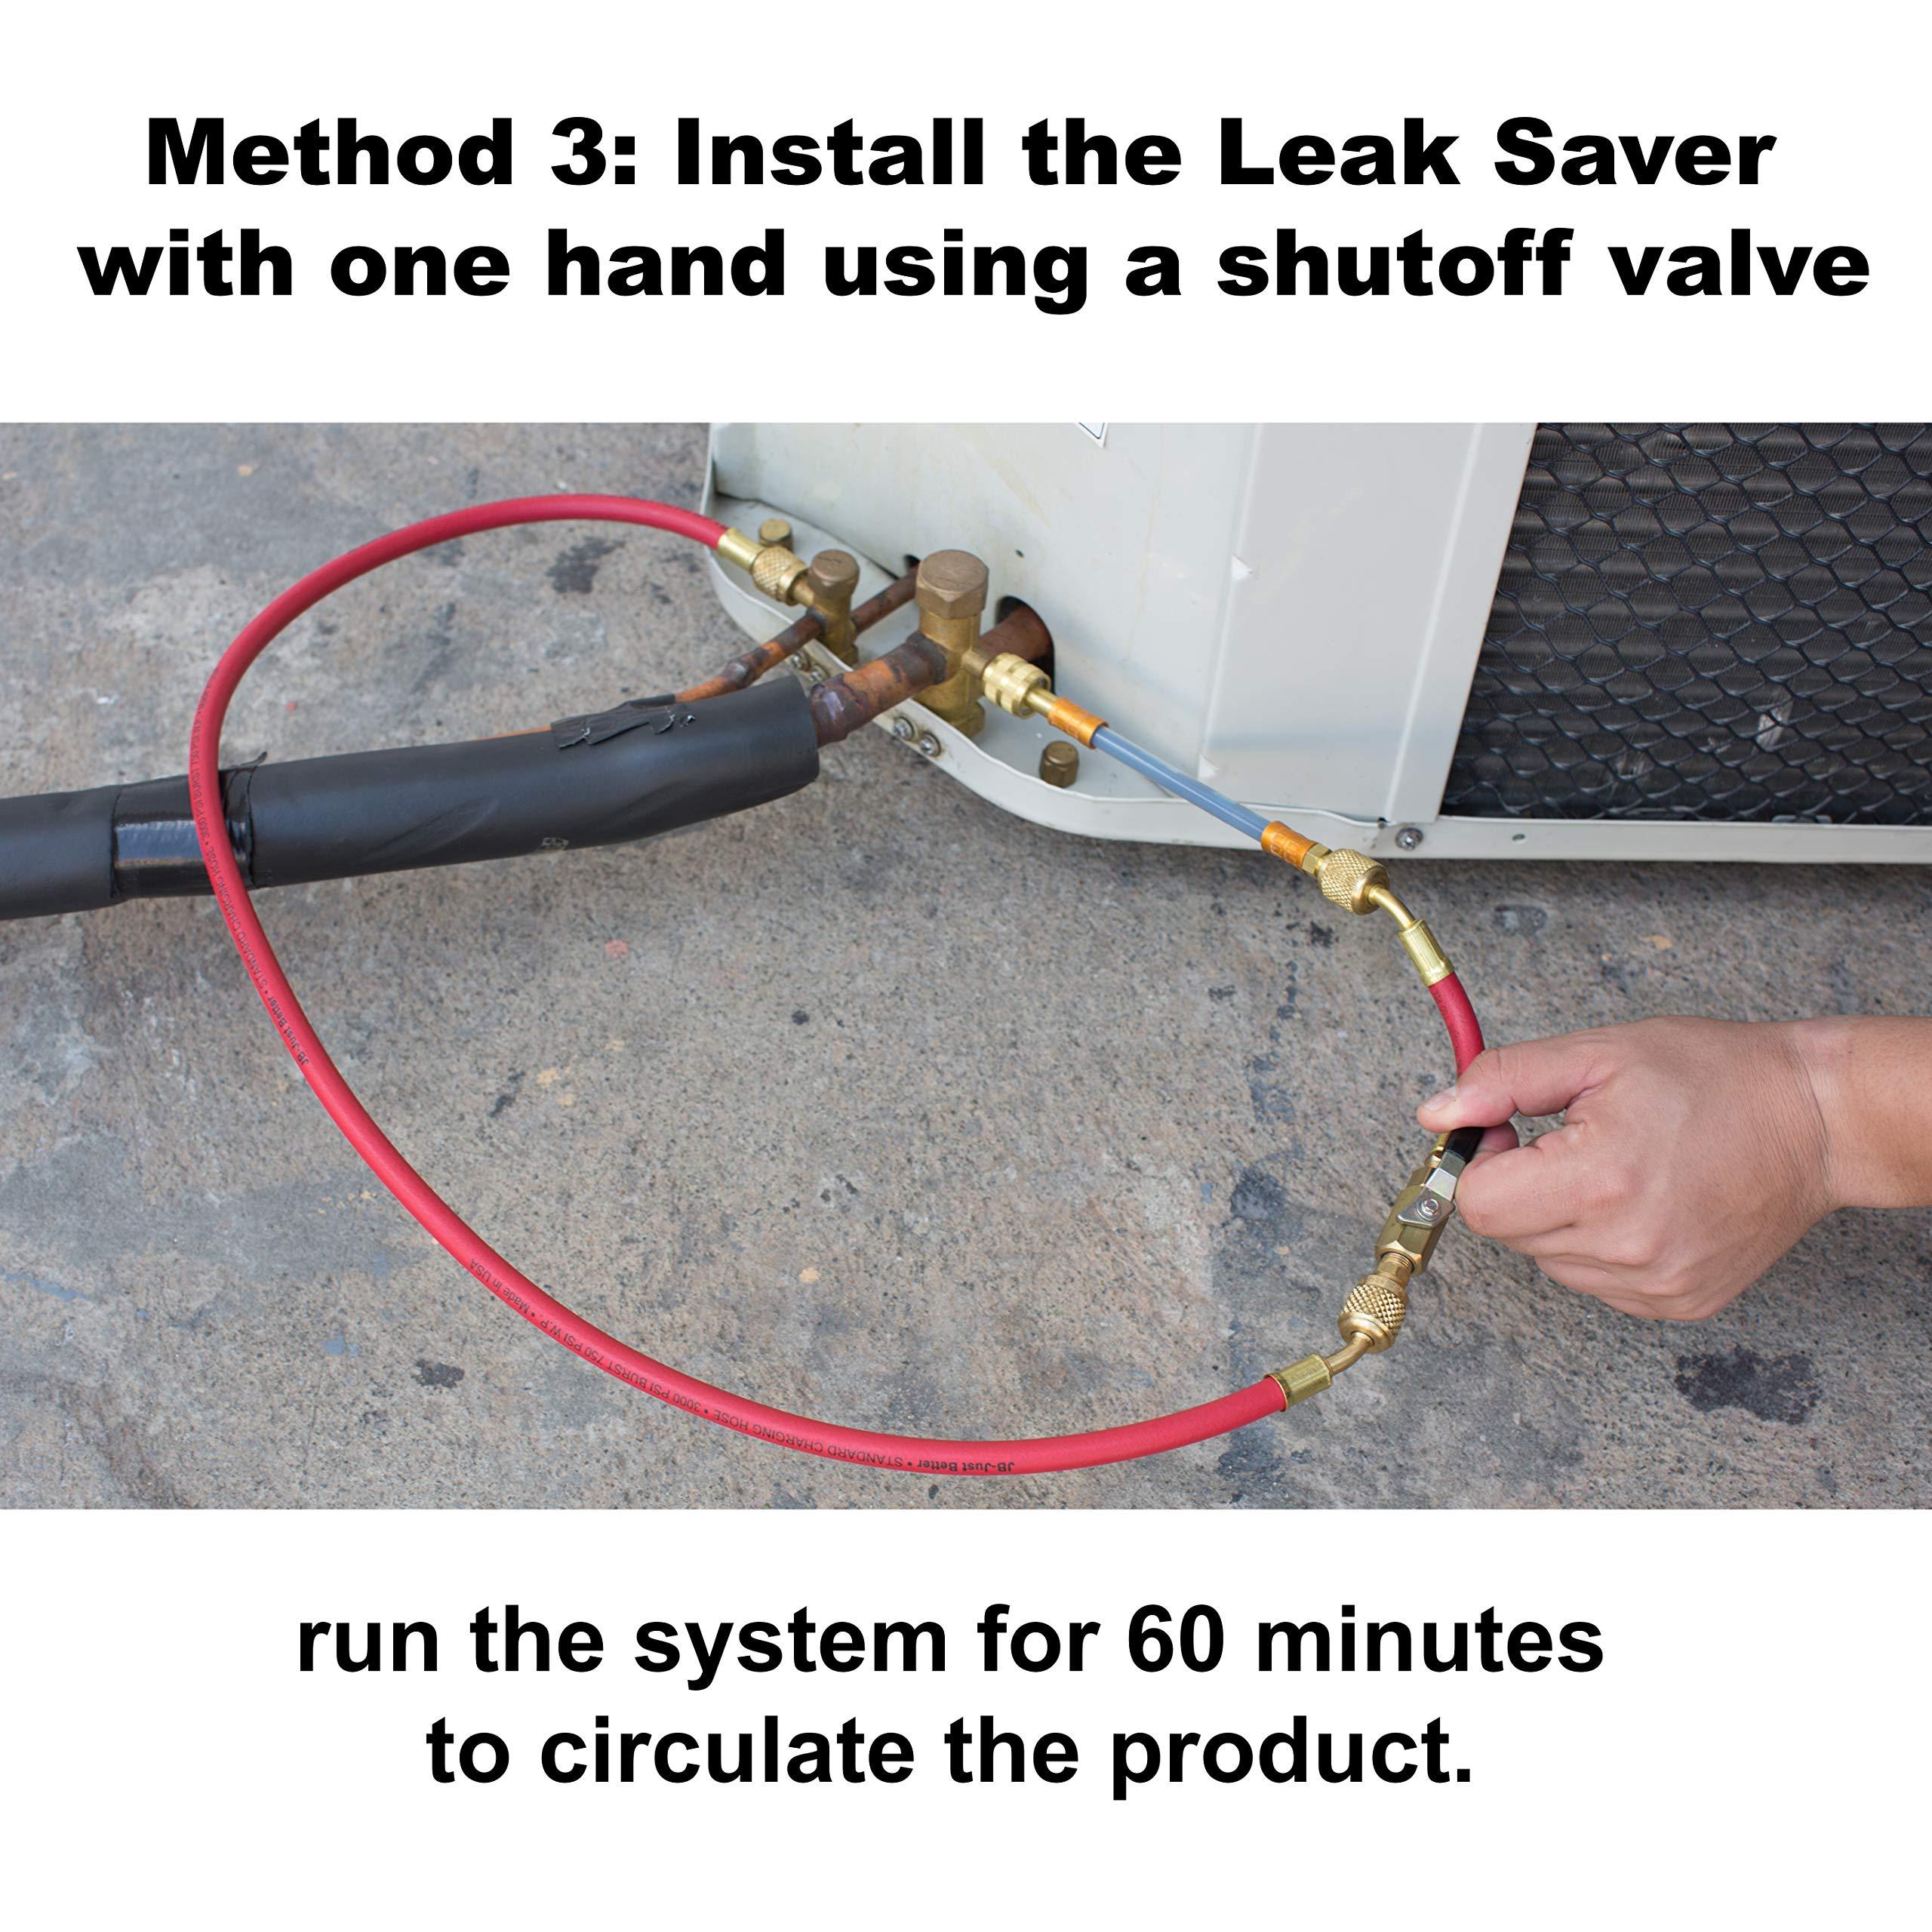 Leak Savers Direct Inject Refrigerant Leak Sealer with UV Dye (3 Pack) by Leak Savers (Image #6)